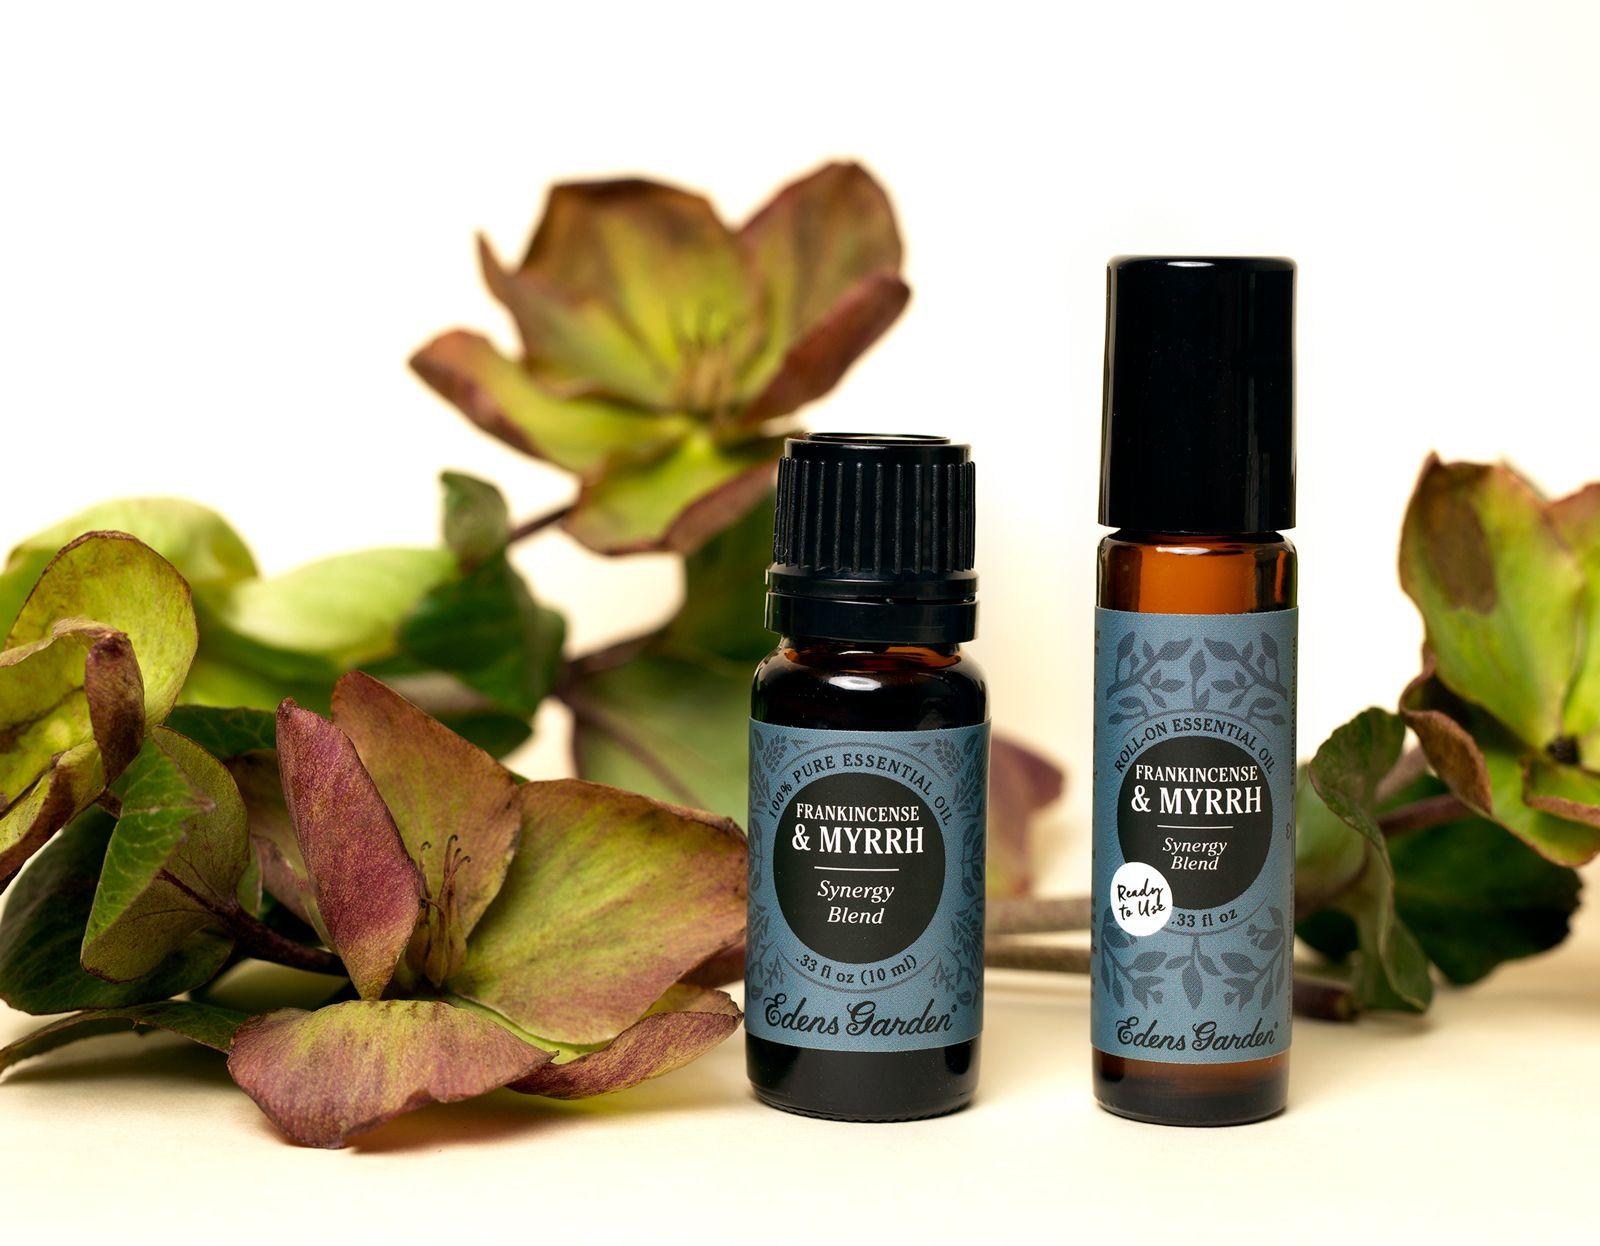 8 Amazing Benefits of Frankincense & Myrrh Synergy Blend